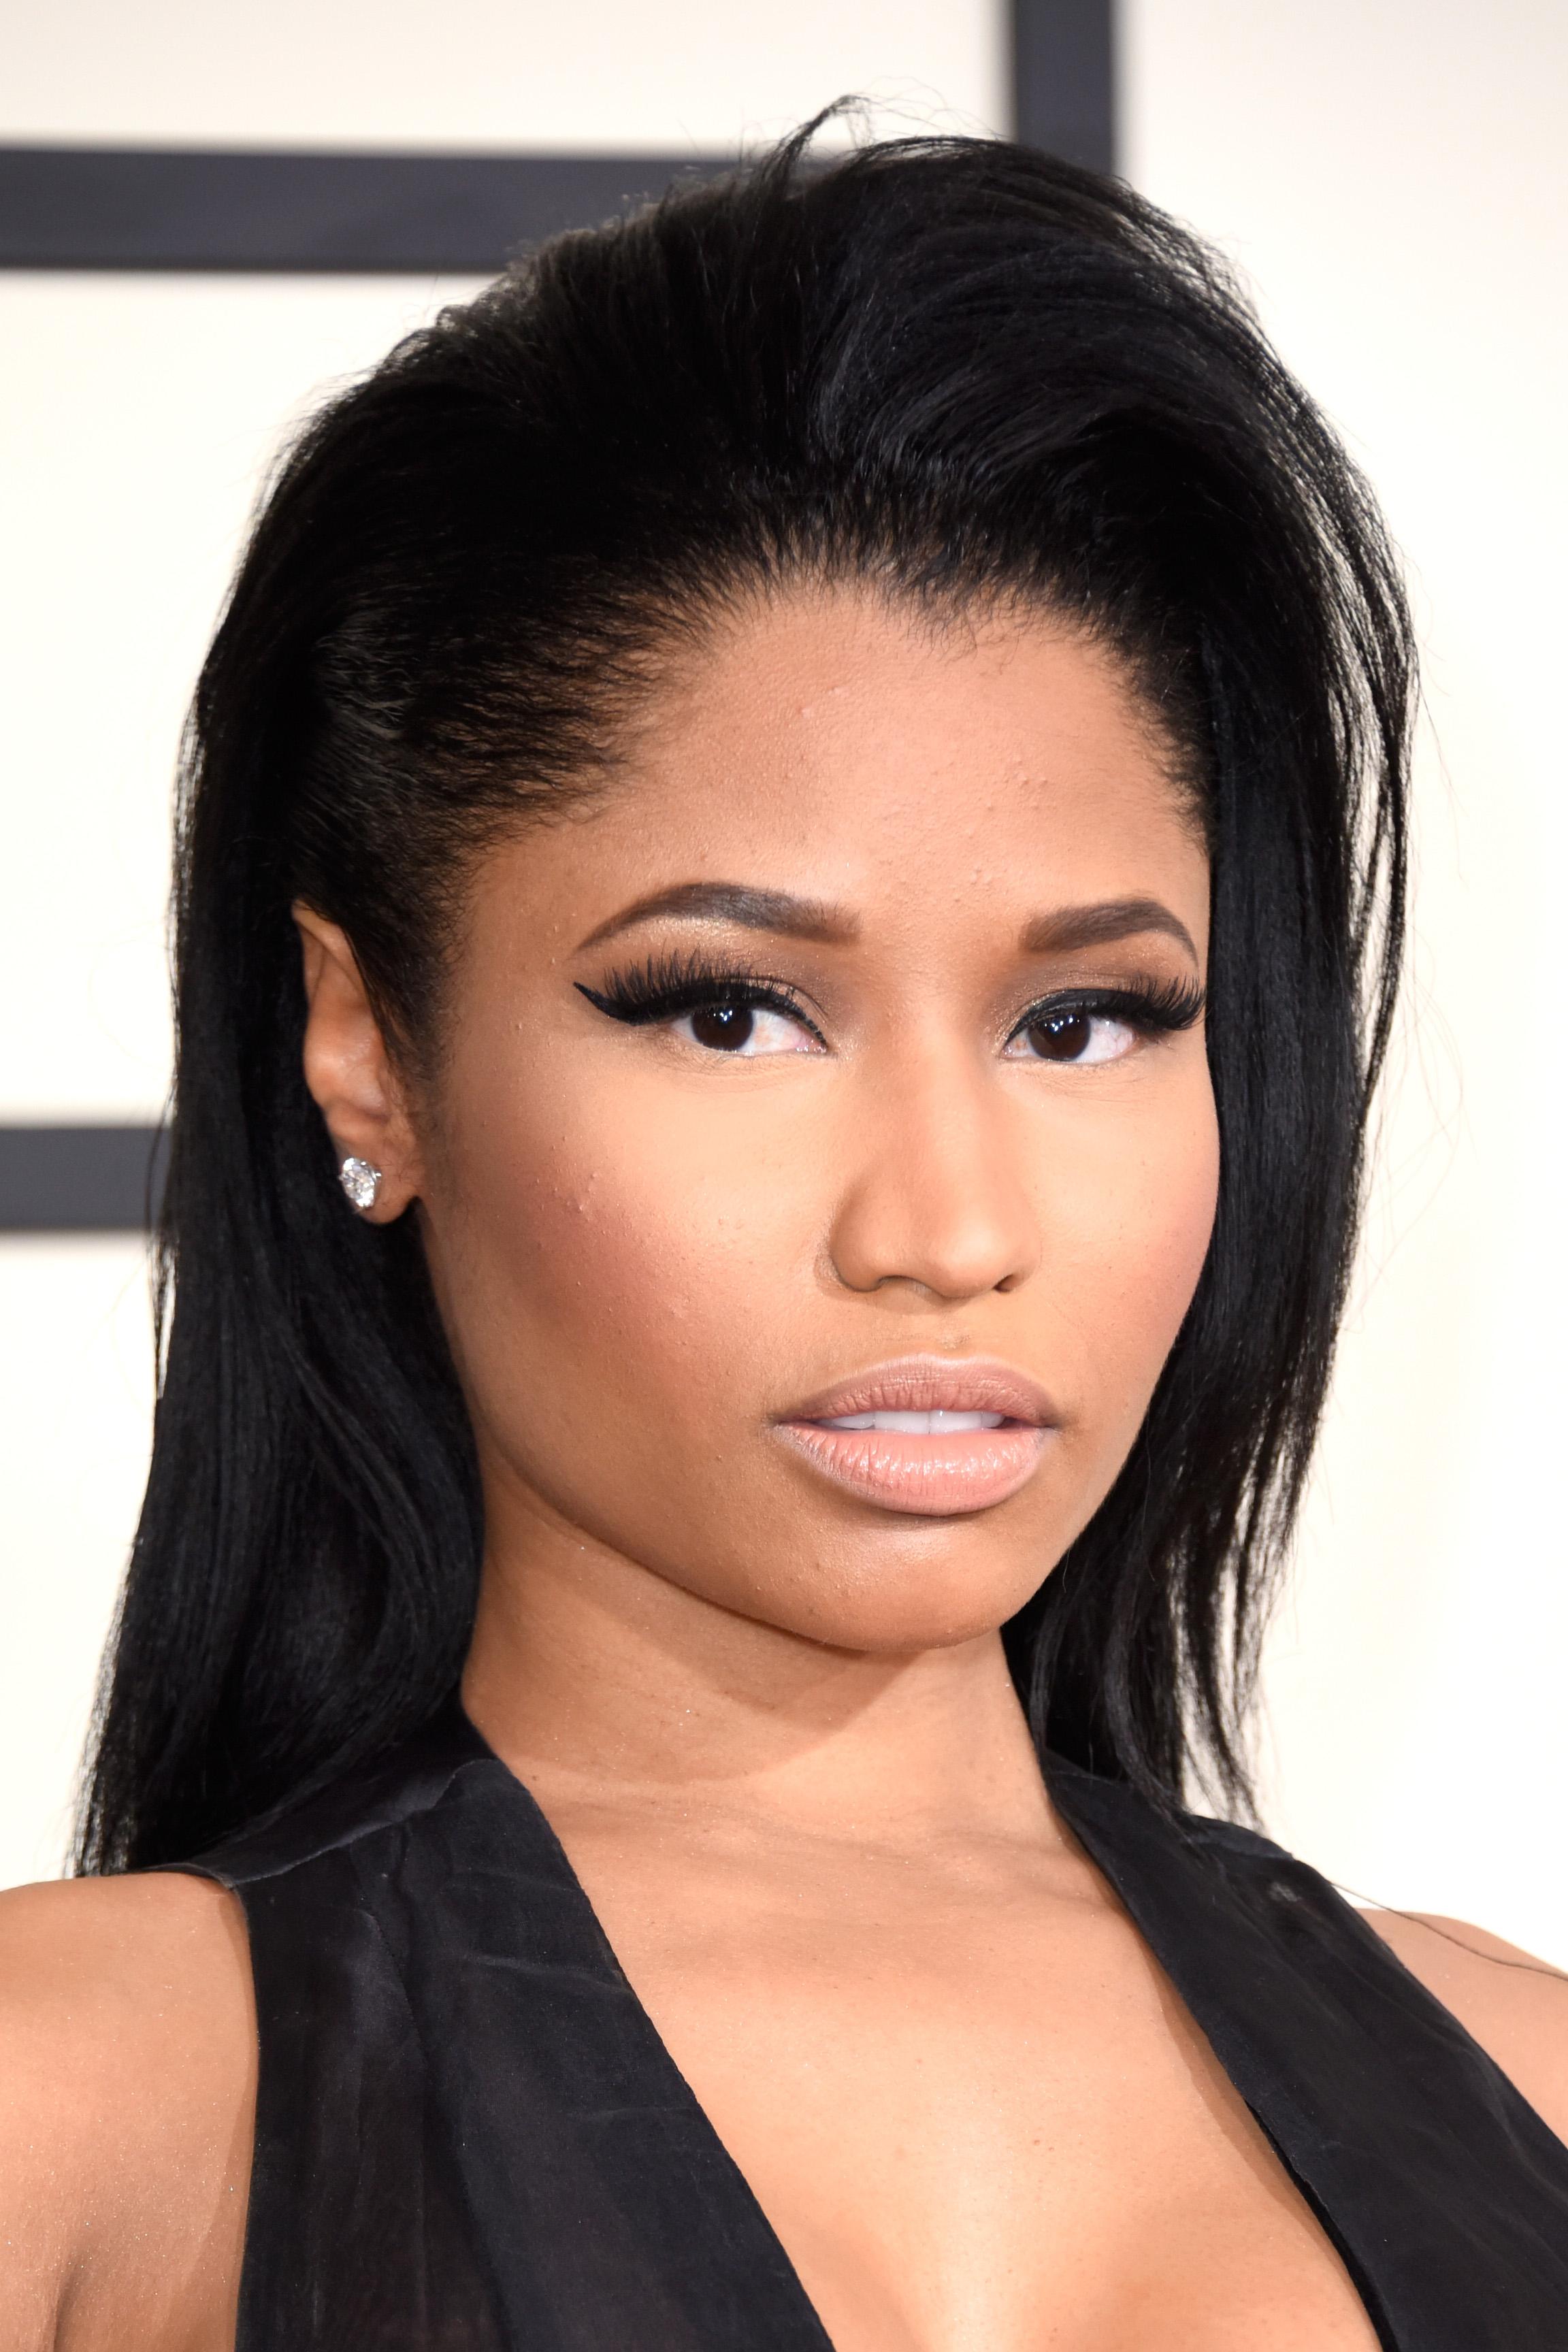 Nicki Minaj attends The 57th Annual GRAMMY Awards on Feb. 8, 2015 in Los Angeles.